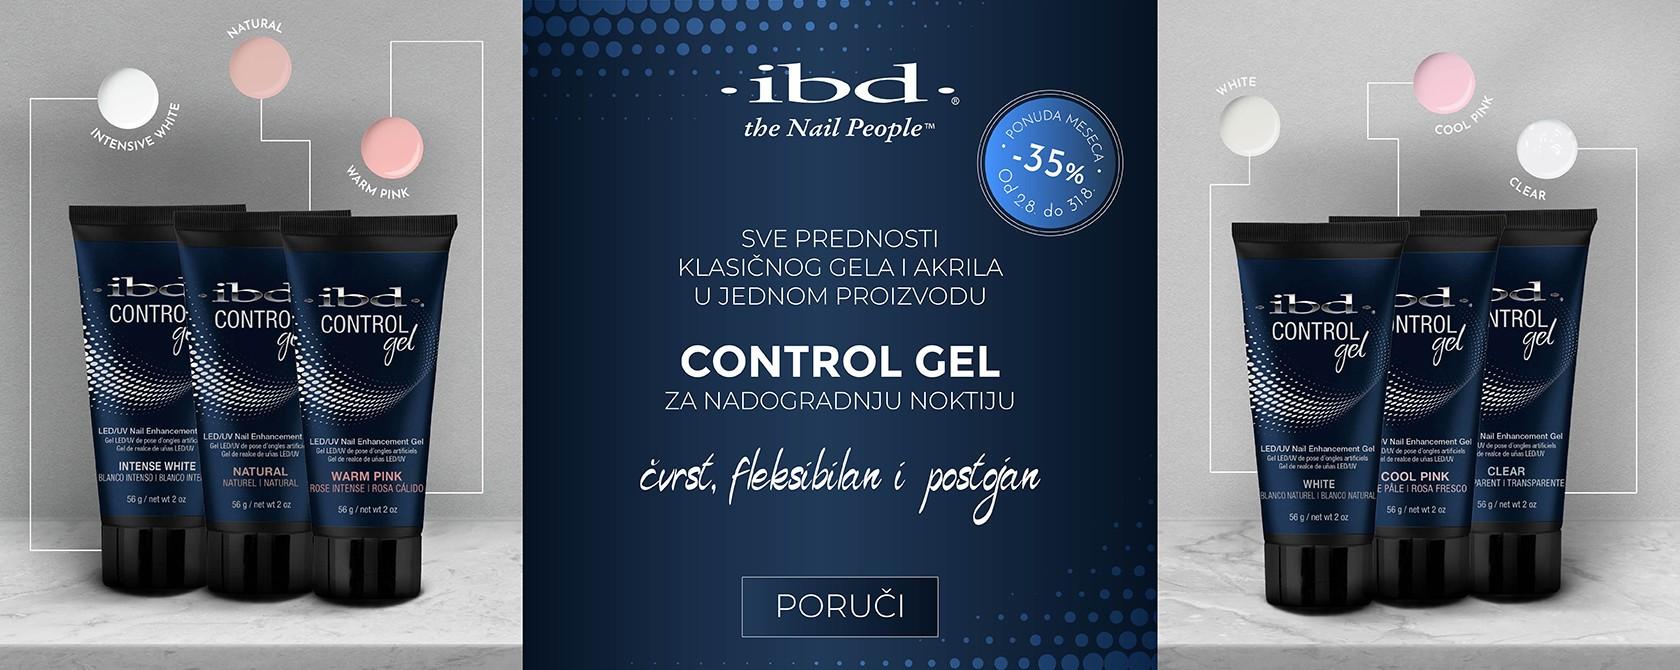 IBD control gelovi